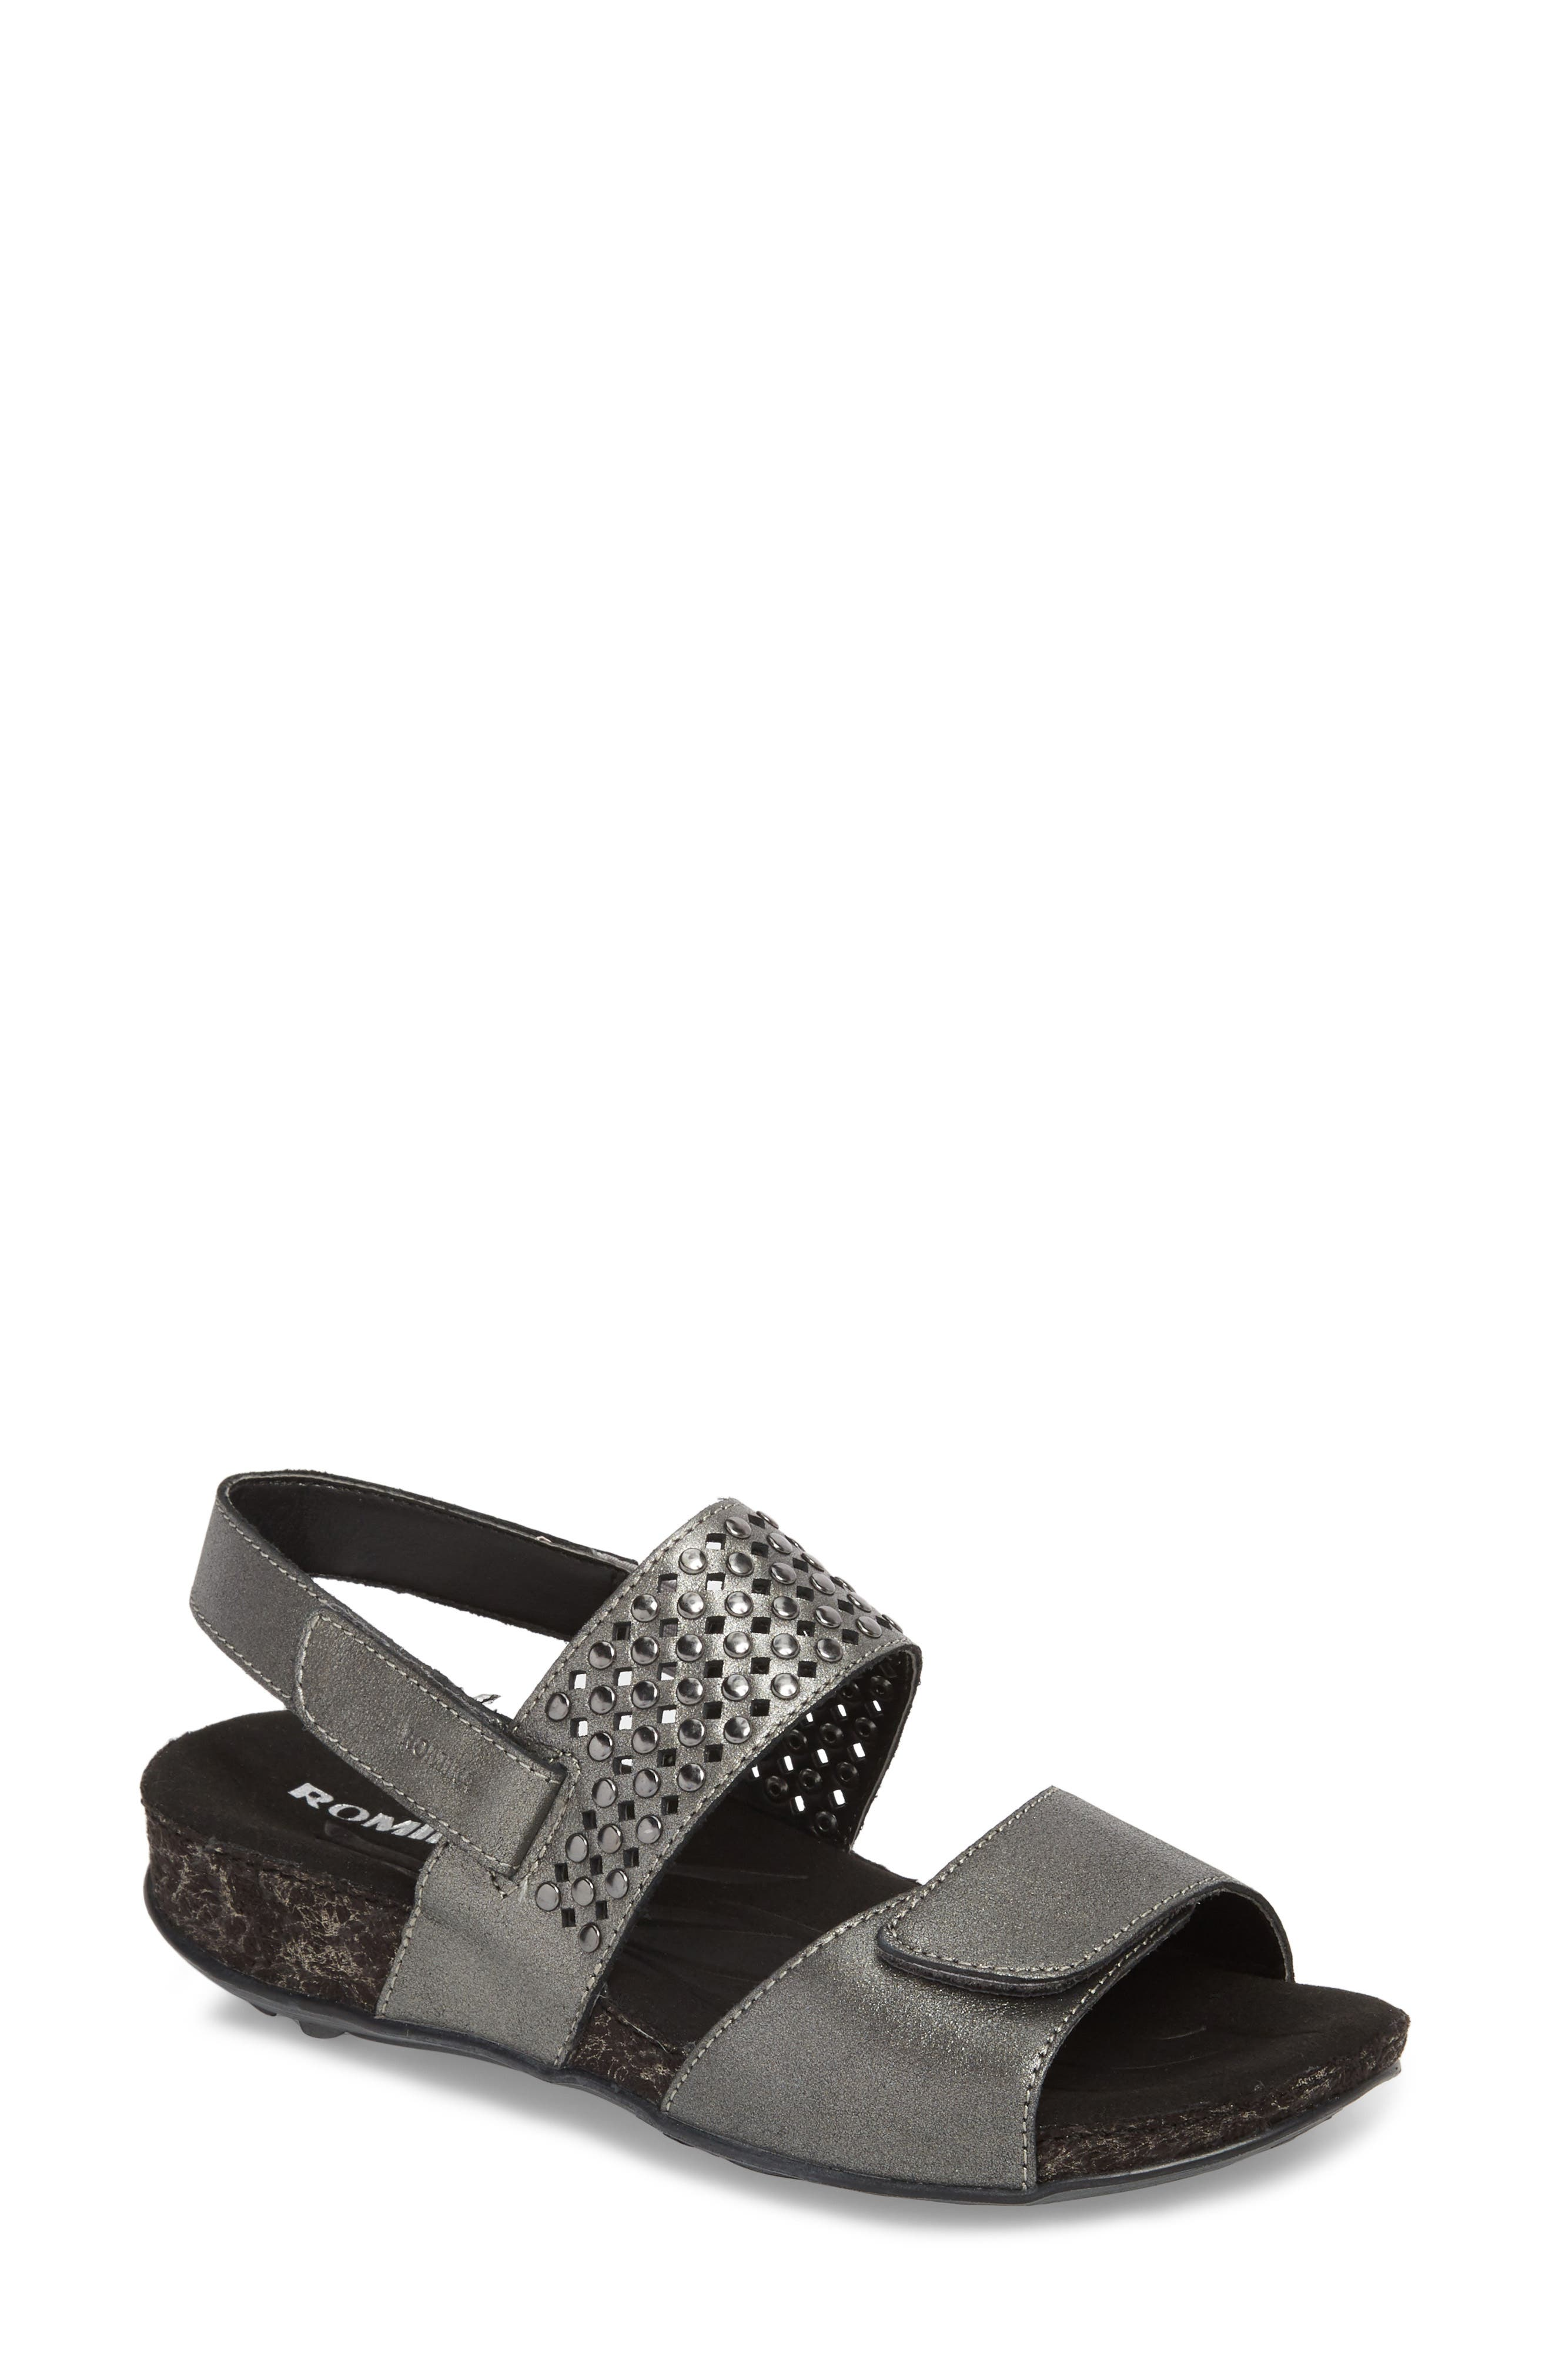 Fidschi 49 Sandal,                         Main,                         color, Anthrazit Leather